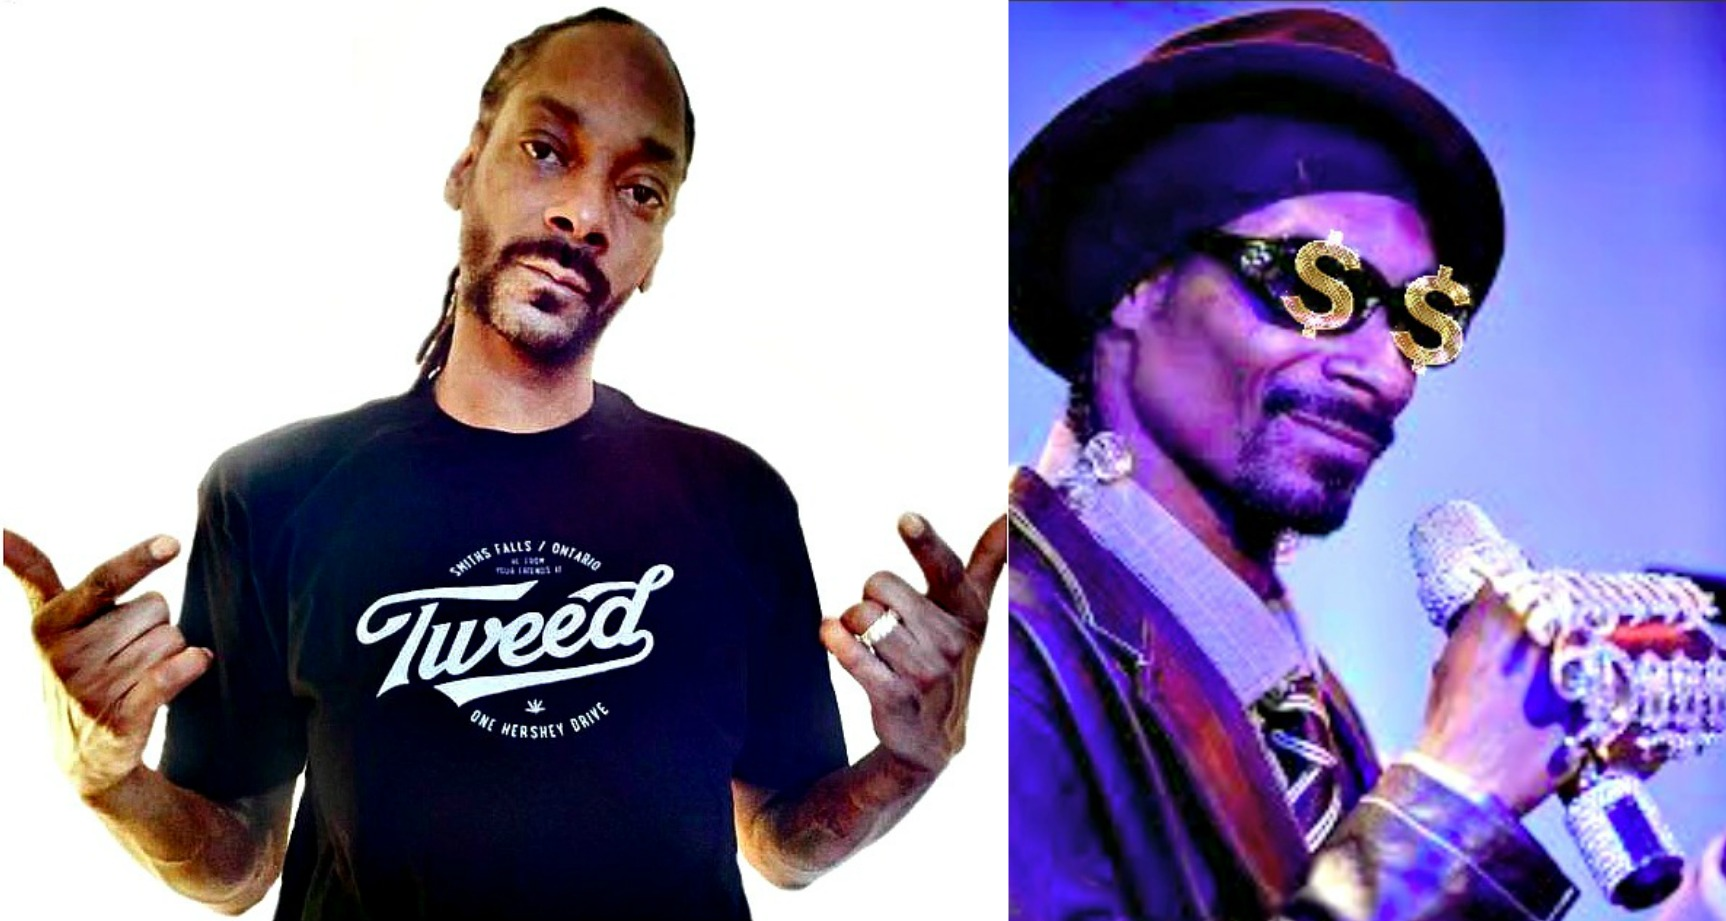 Snoop collage